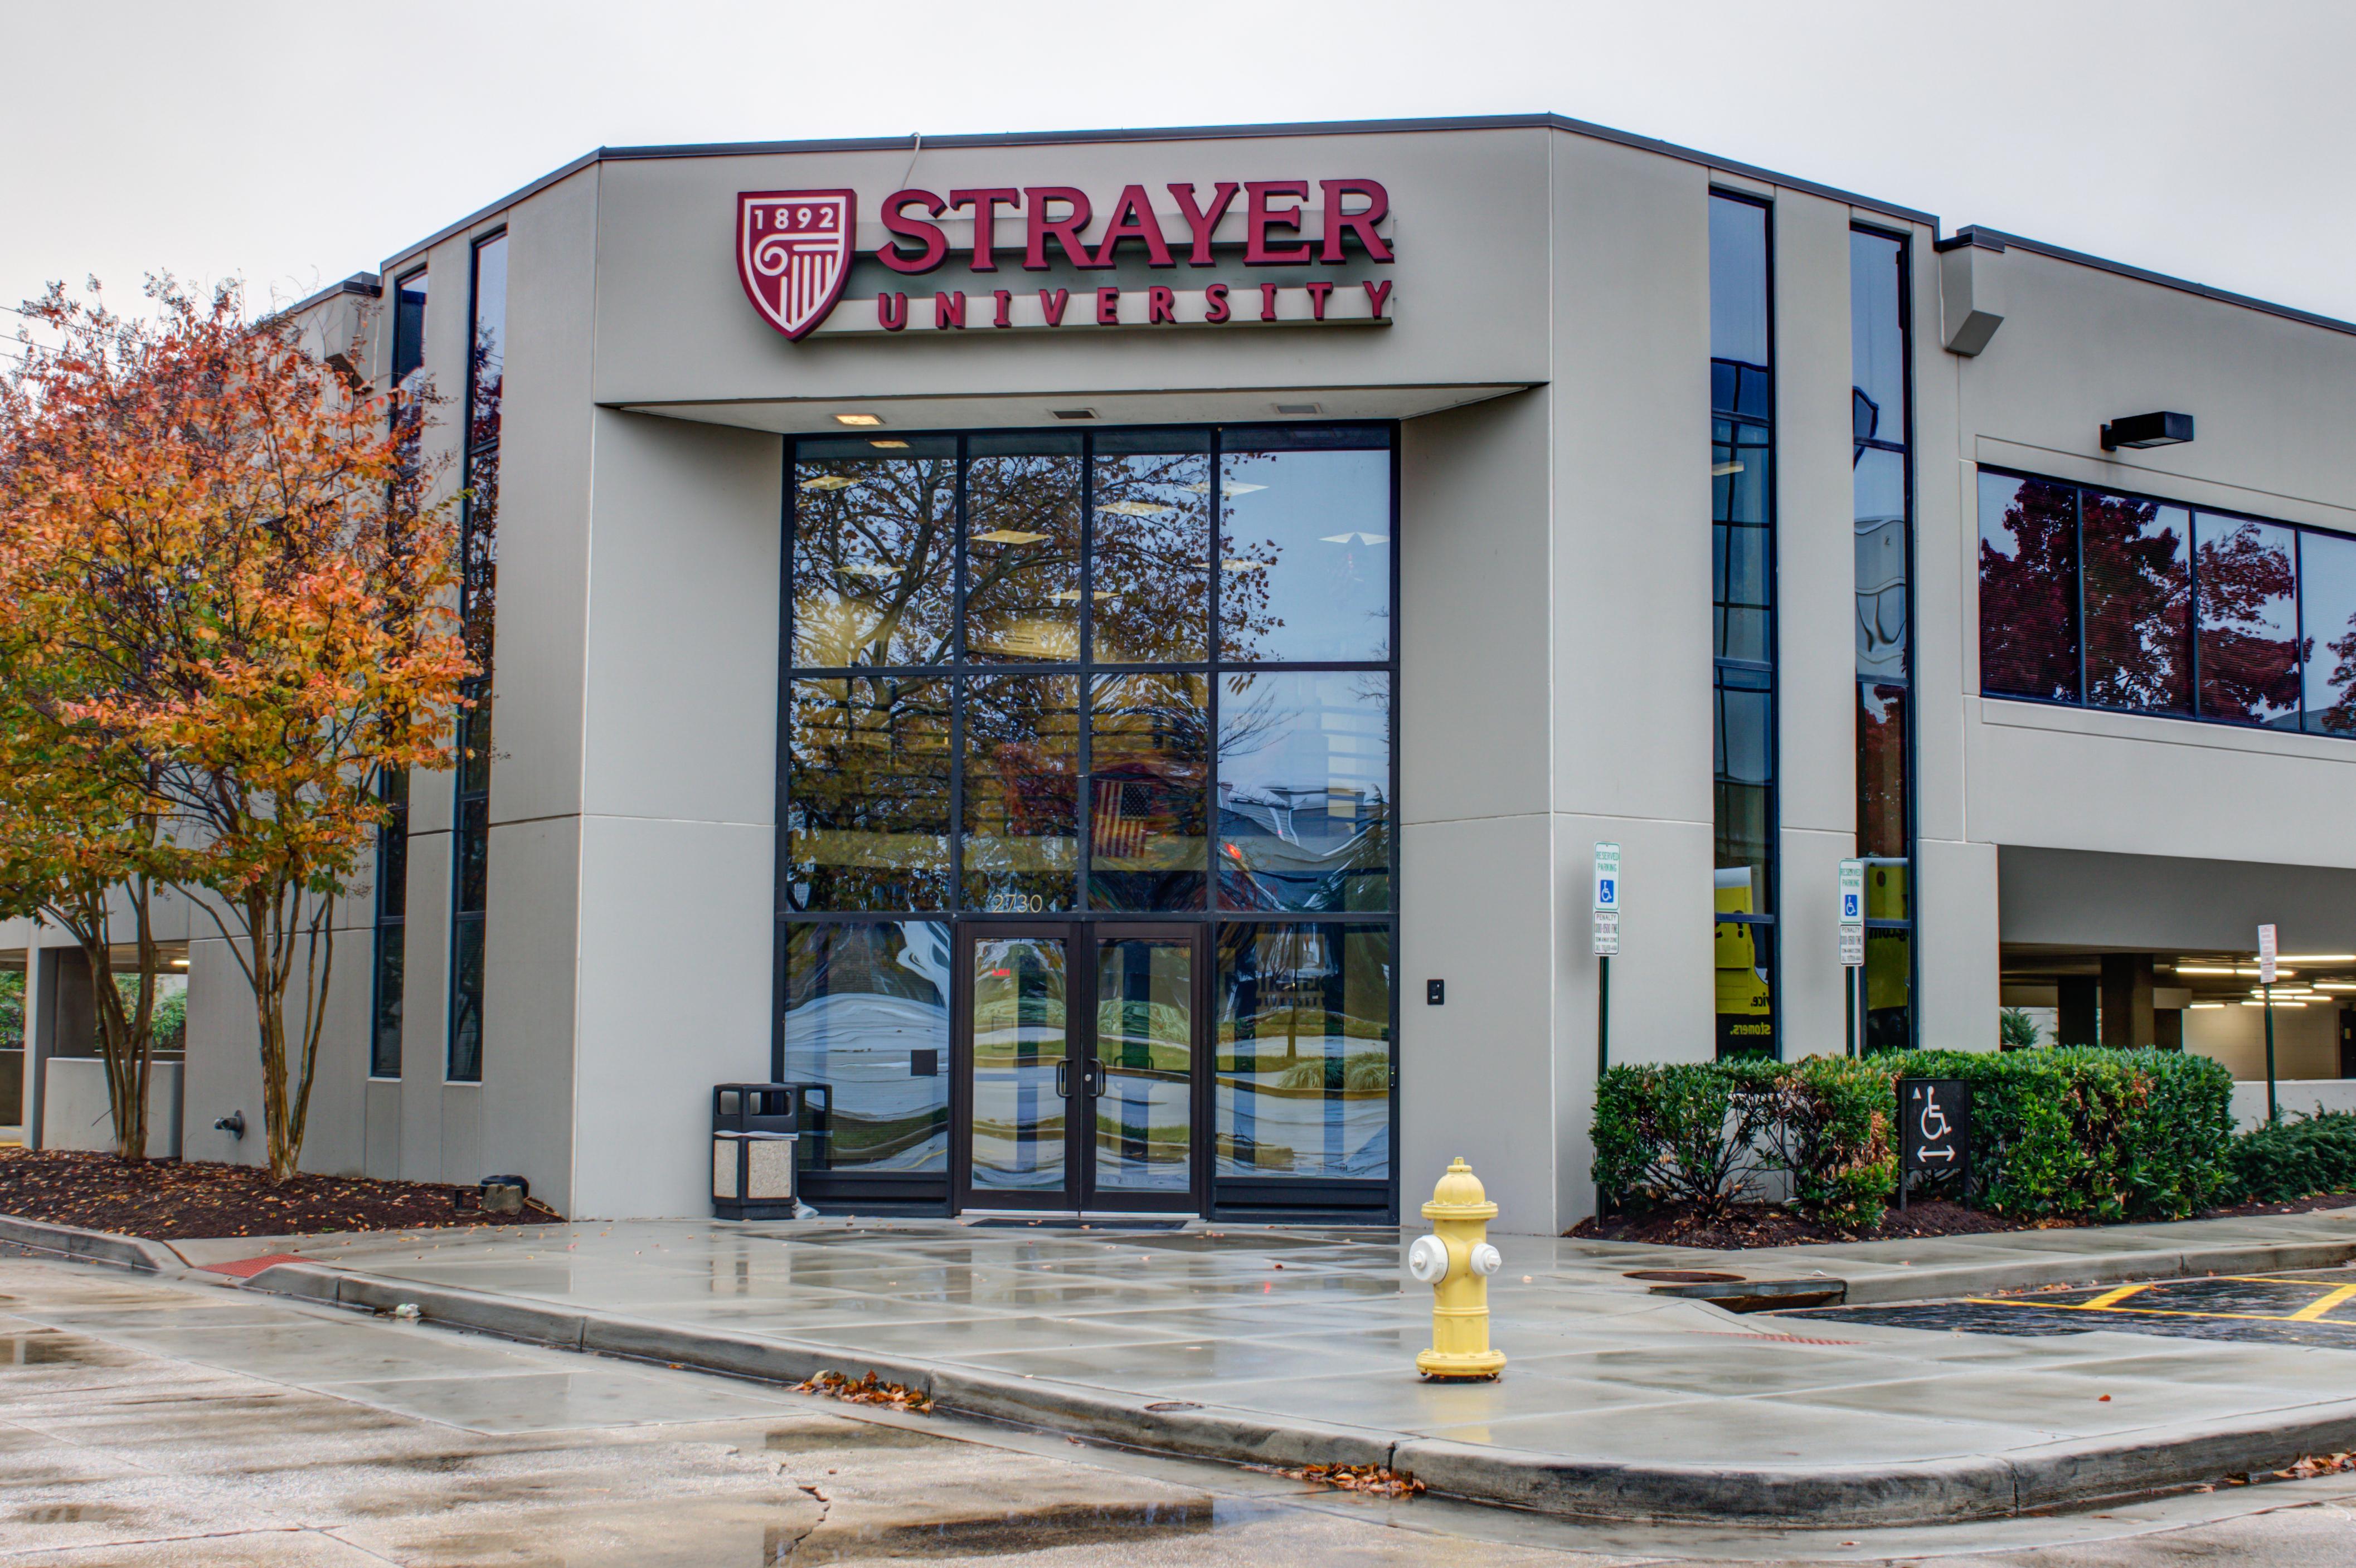 Strayer University image 24